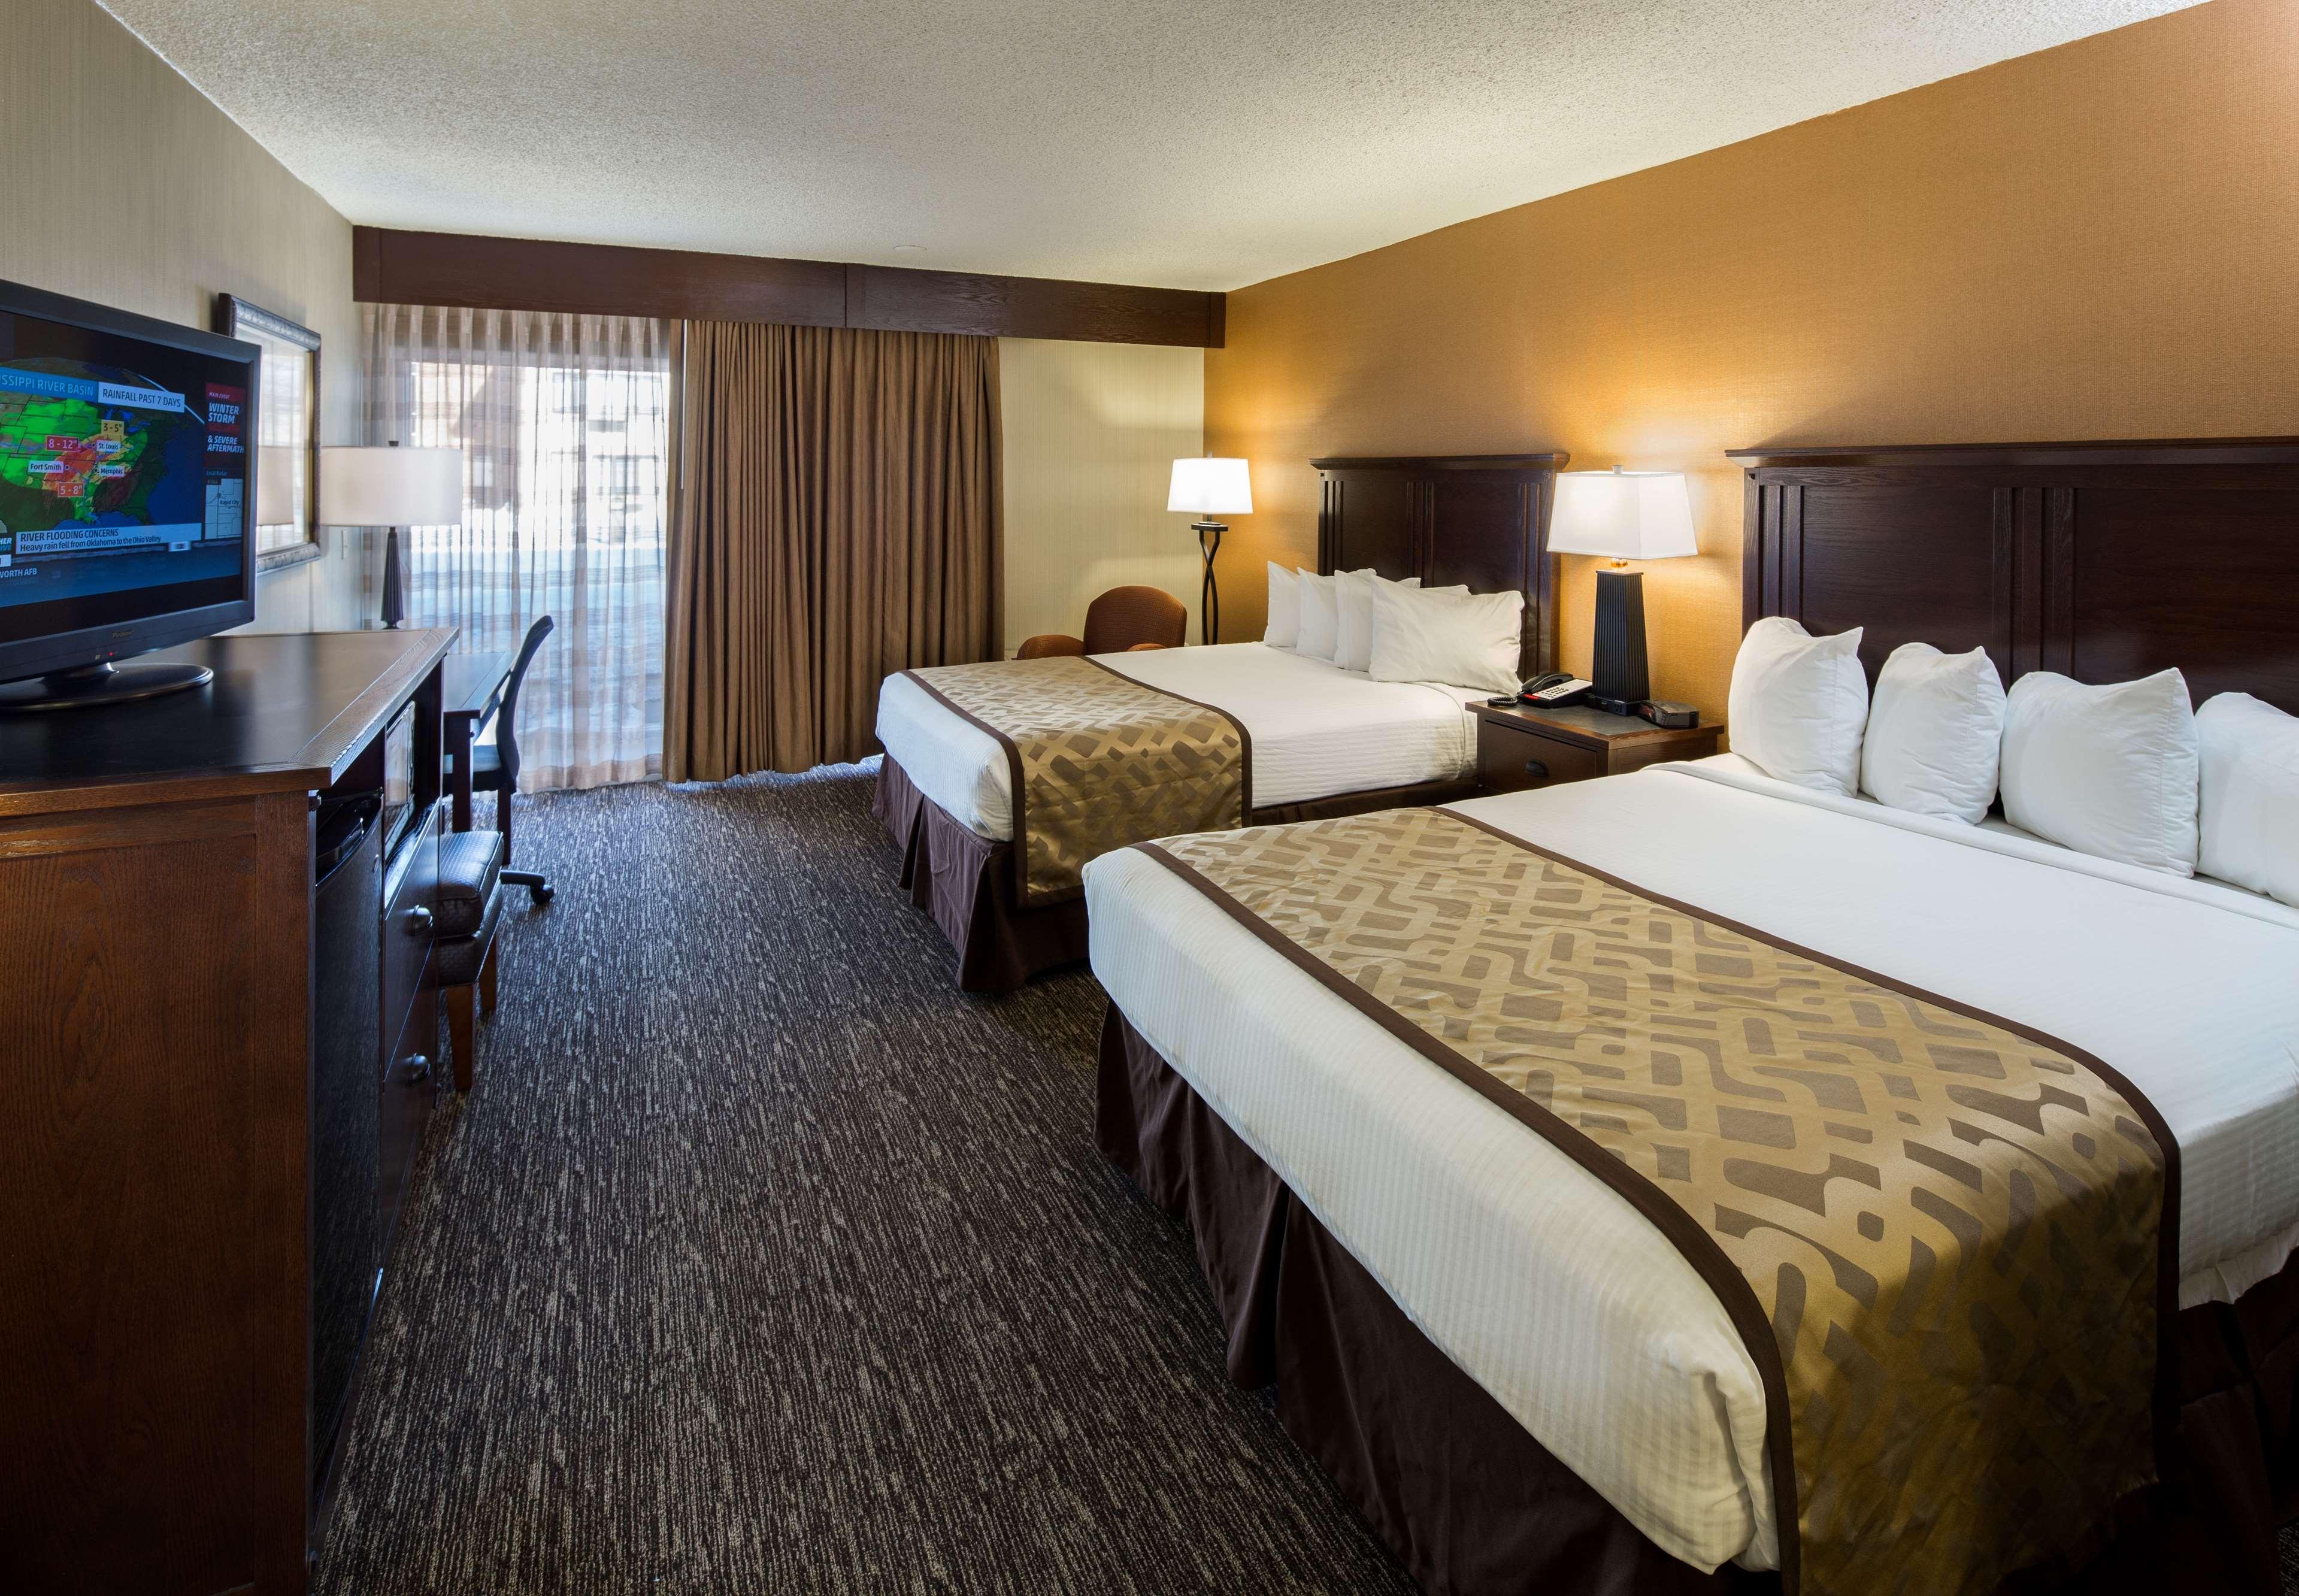 Best Western Ramkota Hotel Rapid City Sd